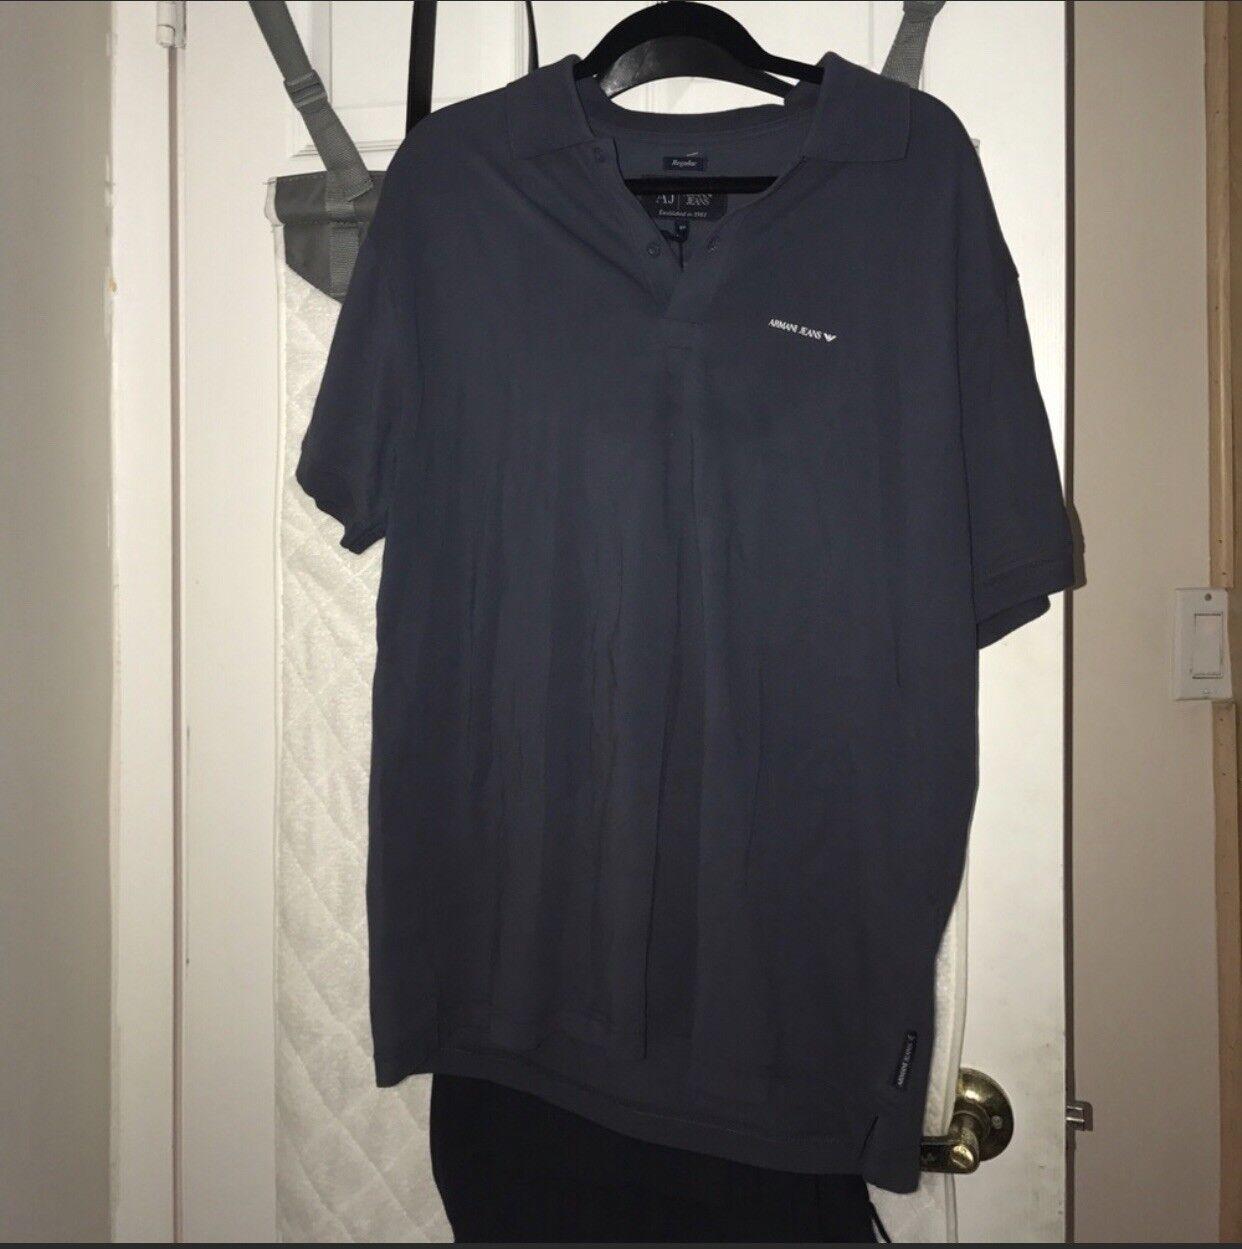 Emporio Armani Shirt Fits Größe XL